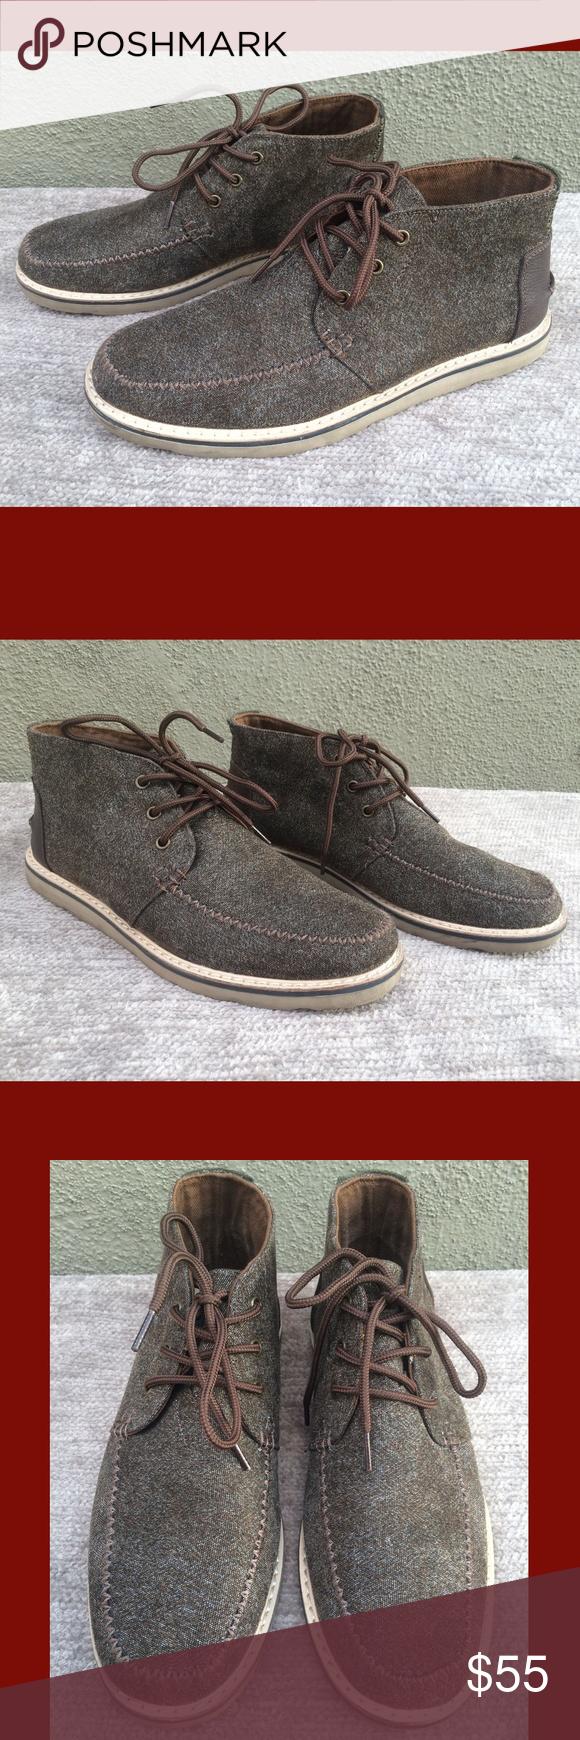 0d123de44d0 Toms Chocolate Brown Brushed Wool Chukka Boots Toms Chocolate Brown Brushed  Wool Lace-Up Chukka